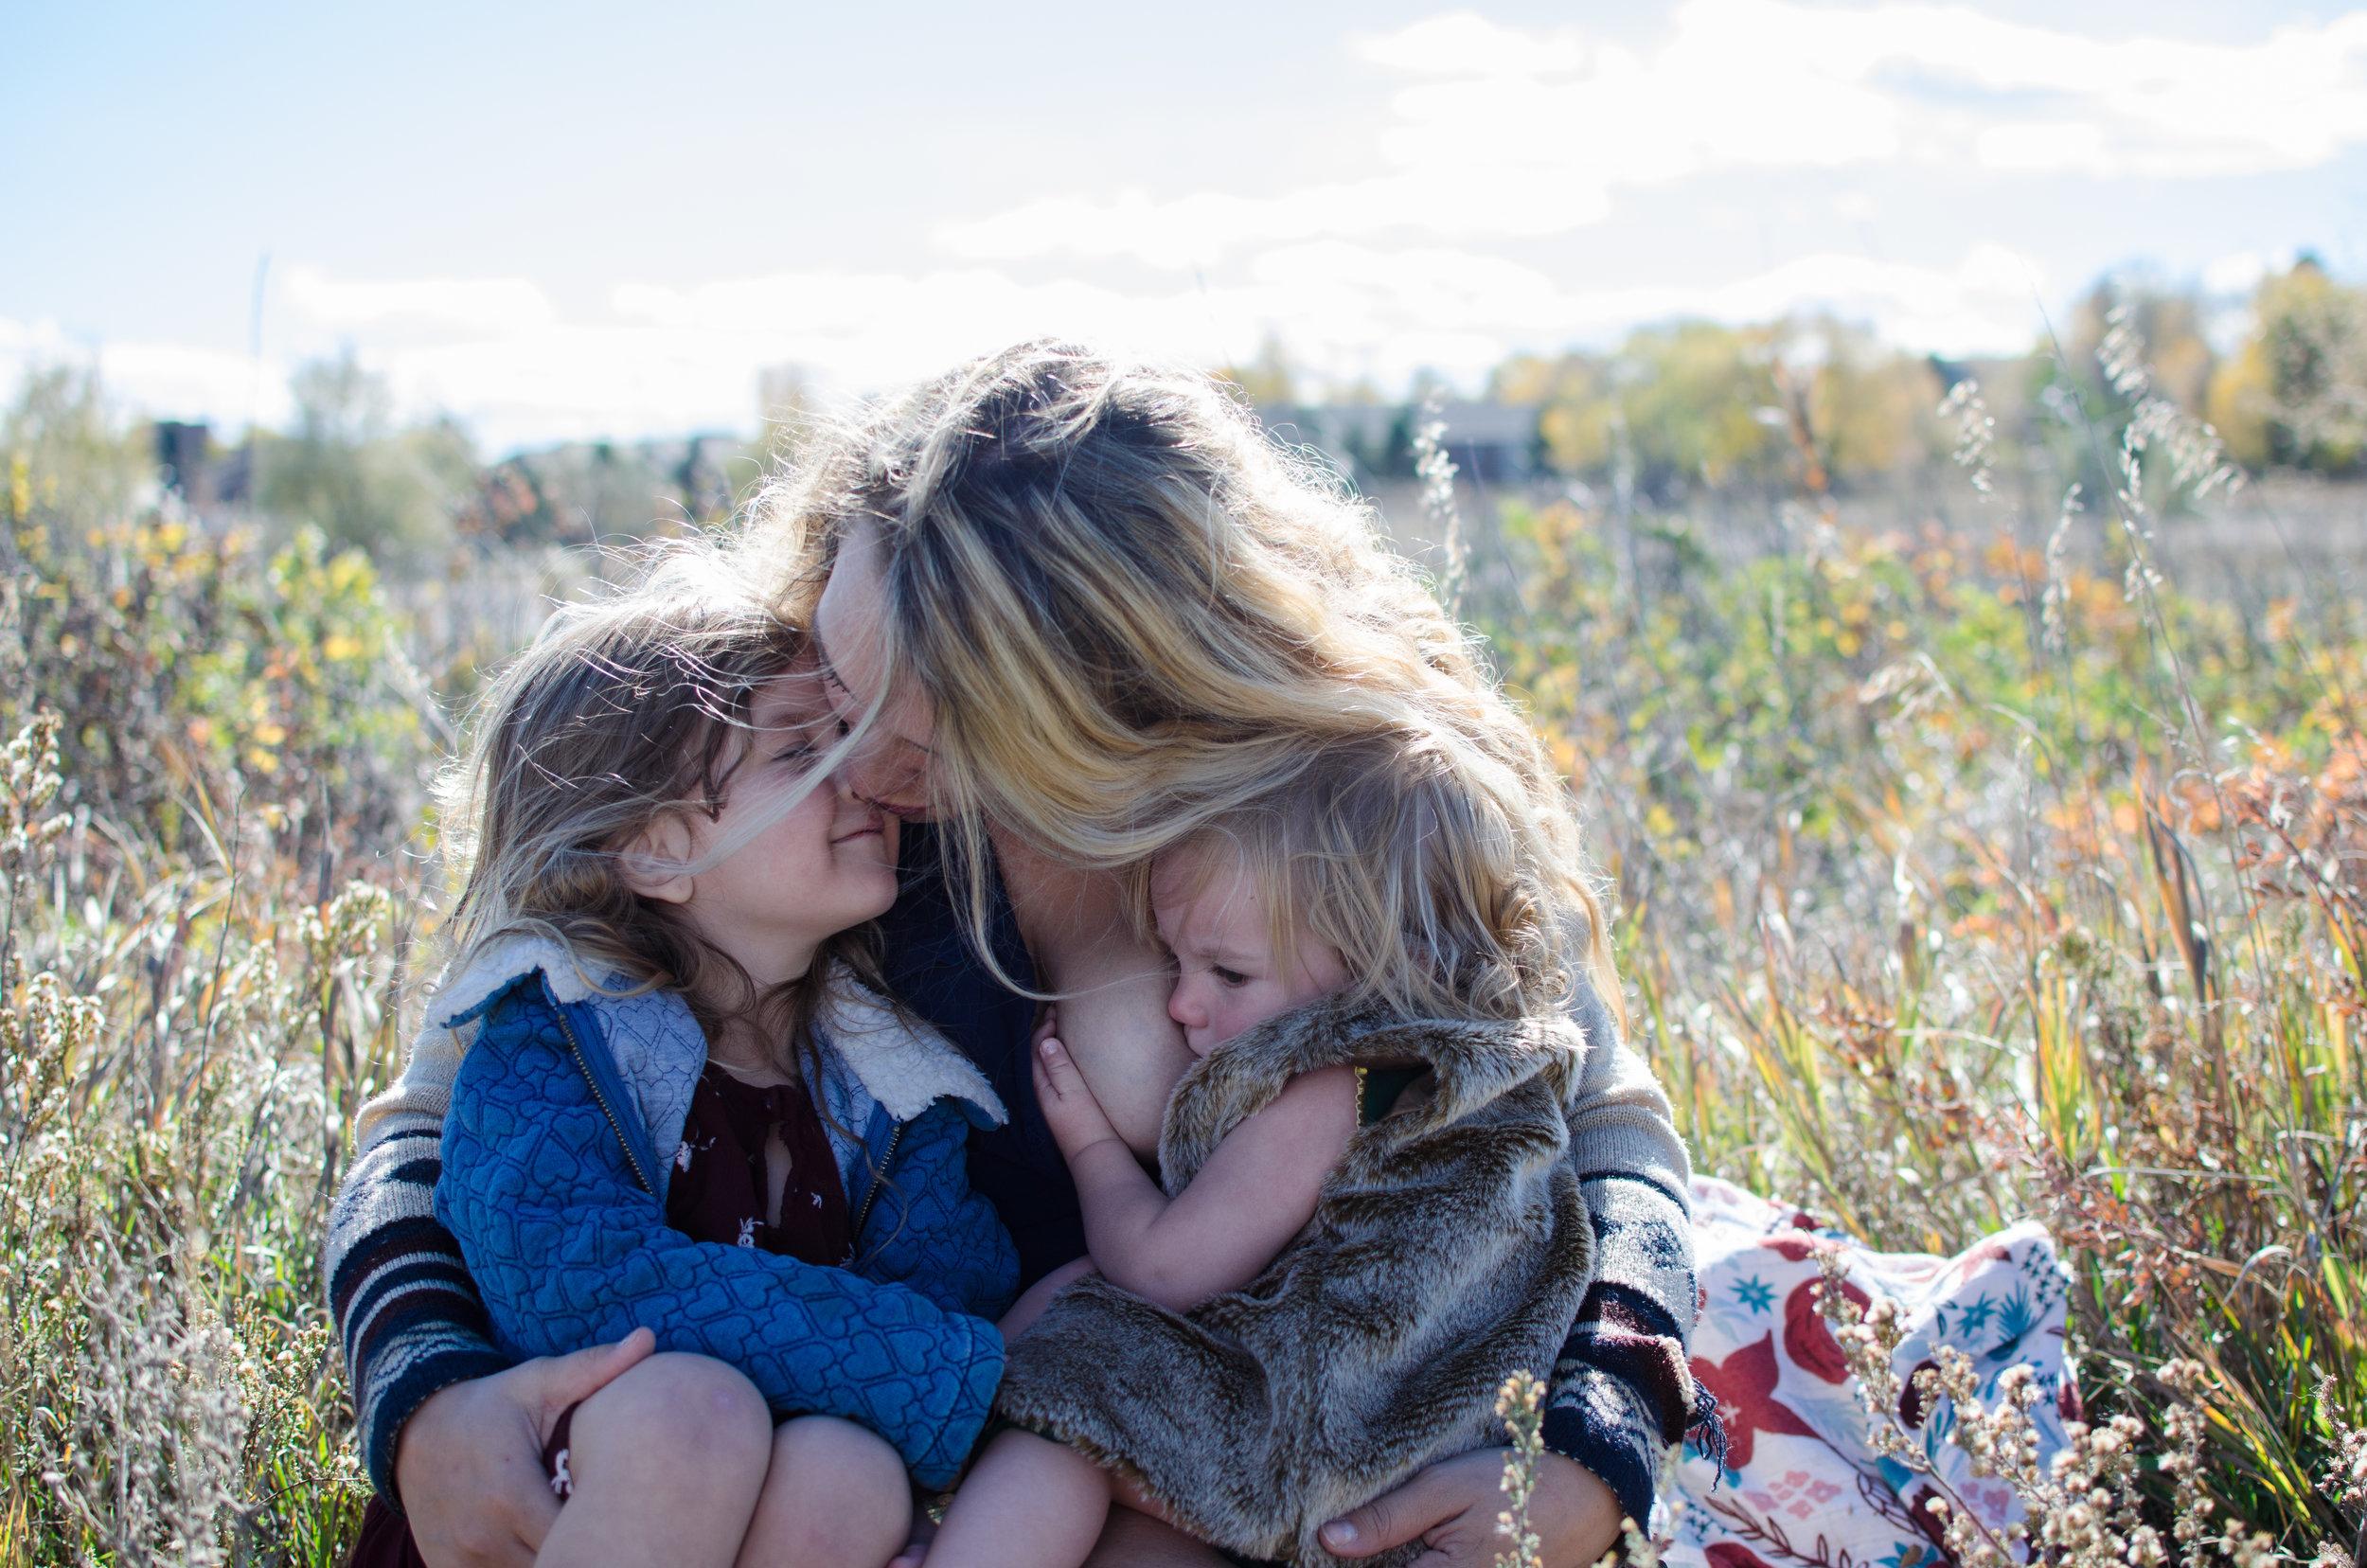 colorado mom photo, miracle kisses, outdoor breastfeeding, liquid gold